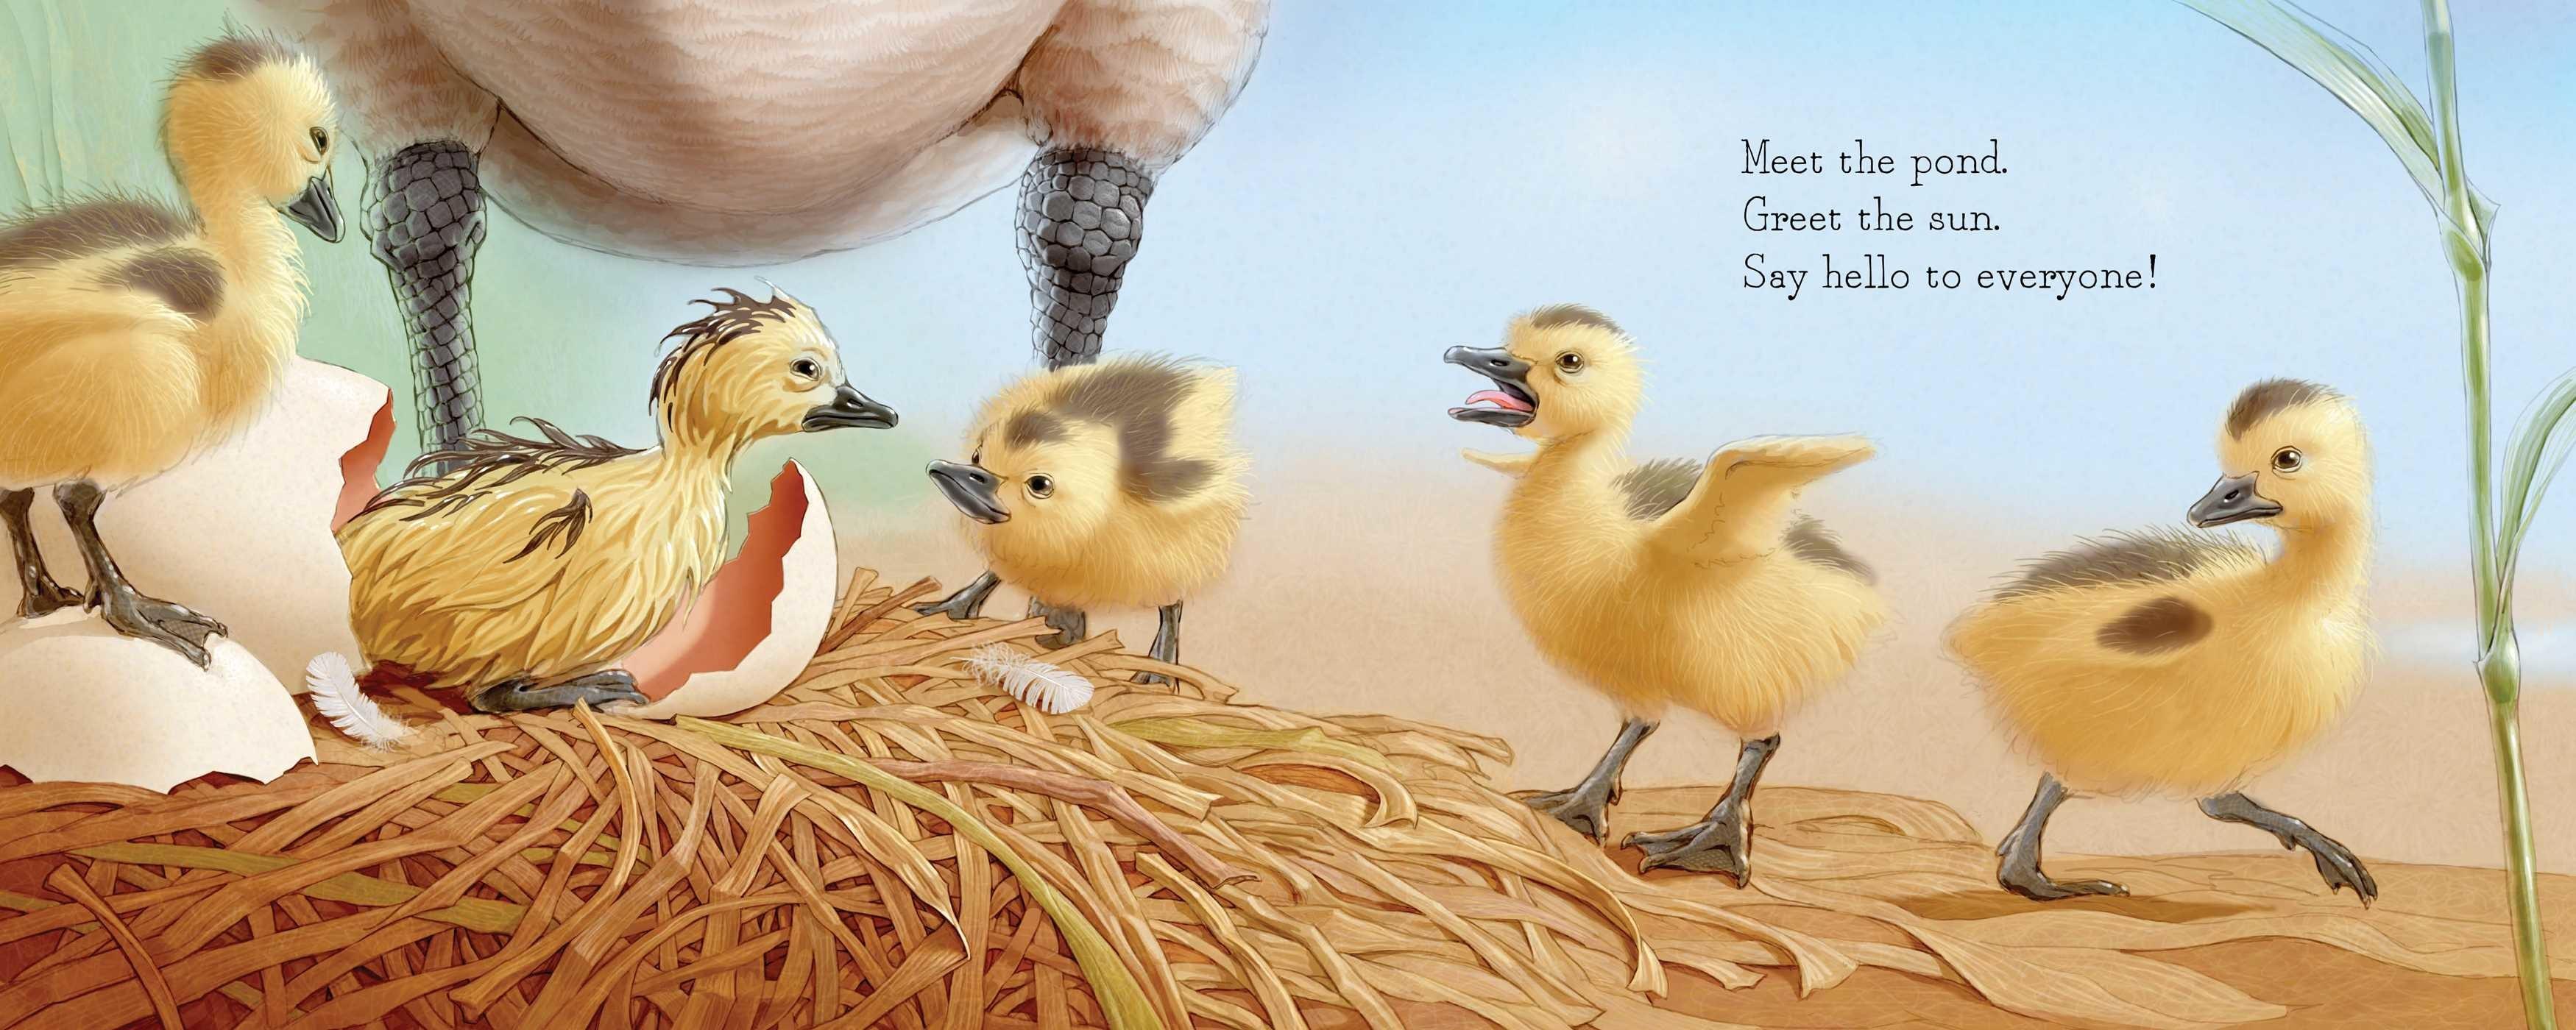 Shake a leg egg 9781481458481.in06